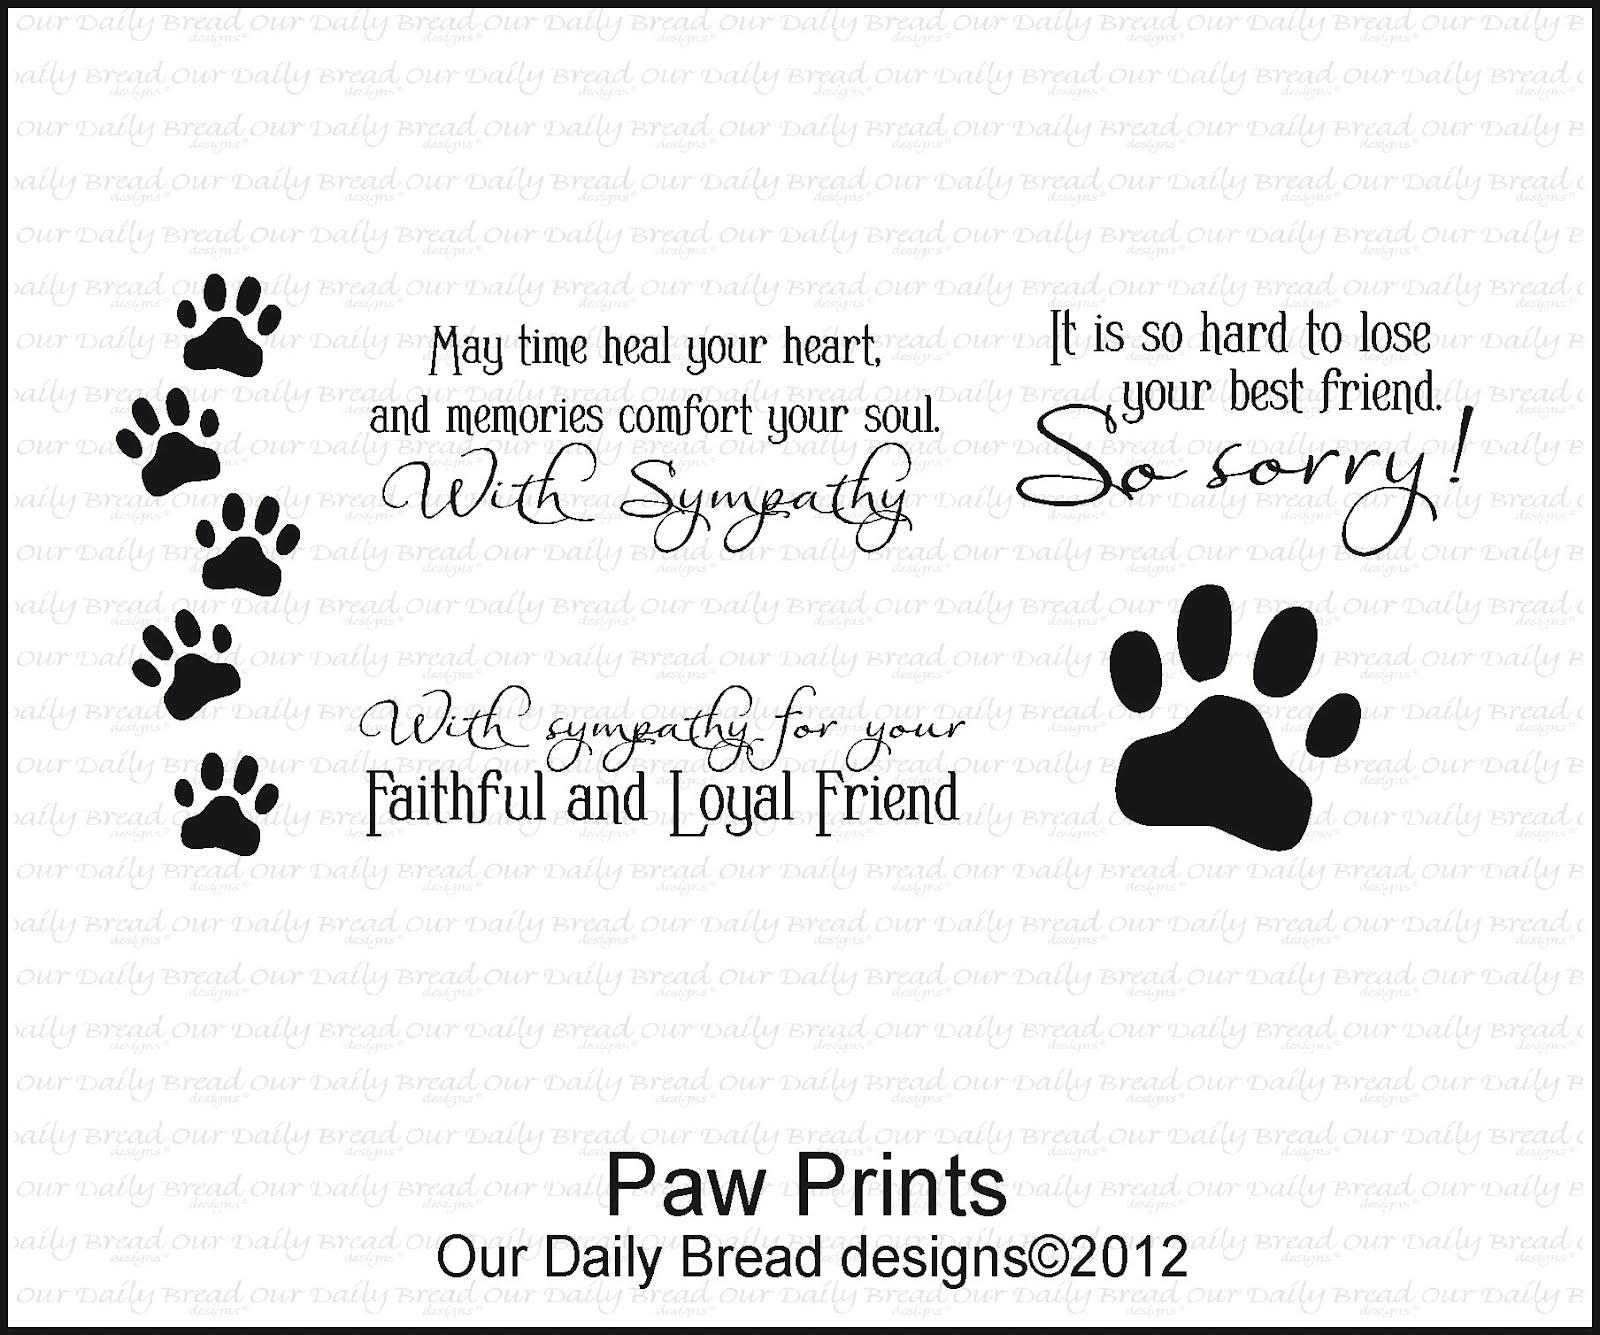 Pet Sympathy Quotes Paw Prints Quotesgram